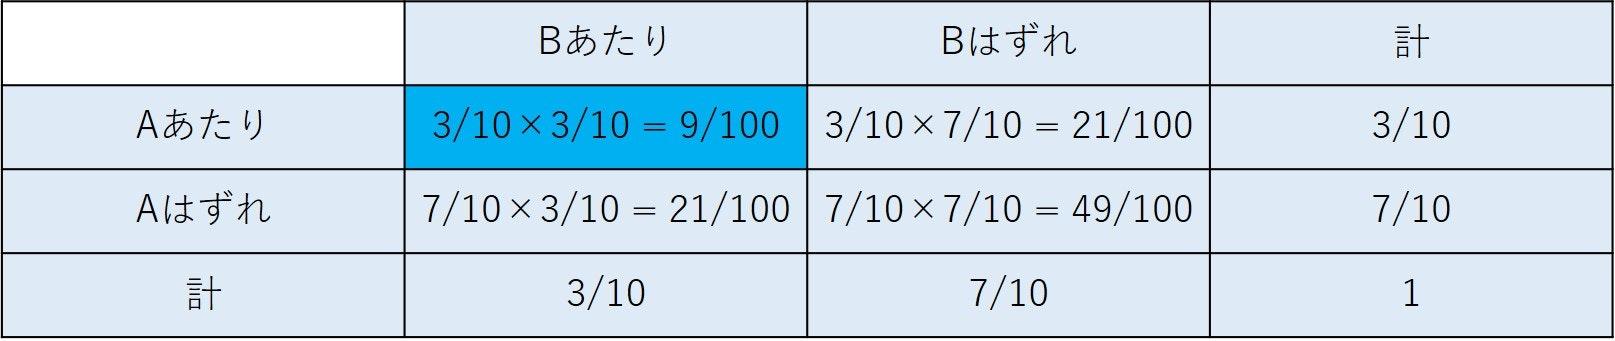 条件付き確率4.jpg